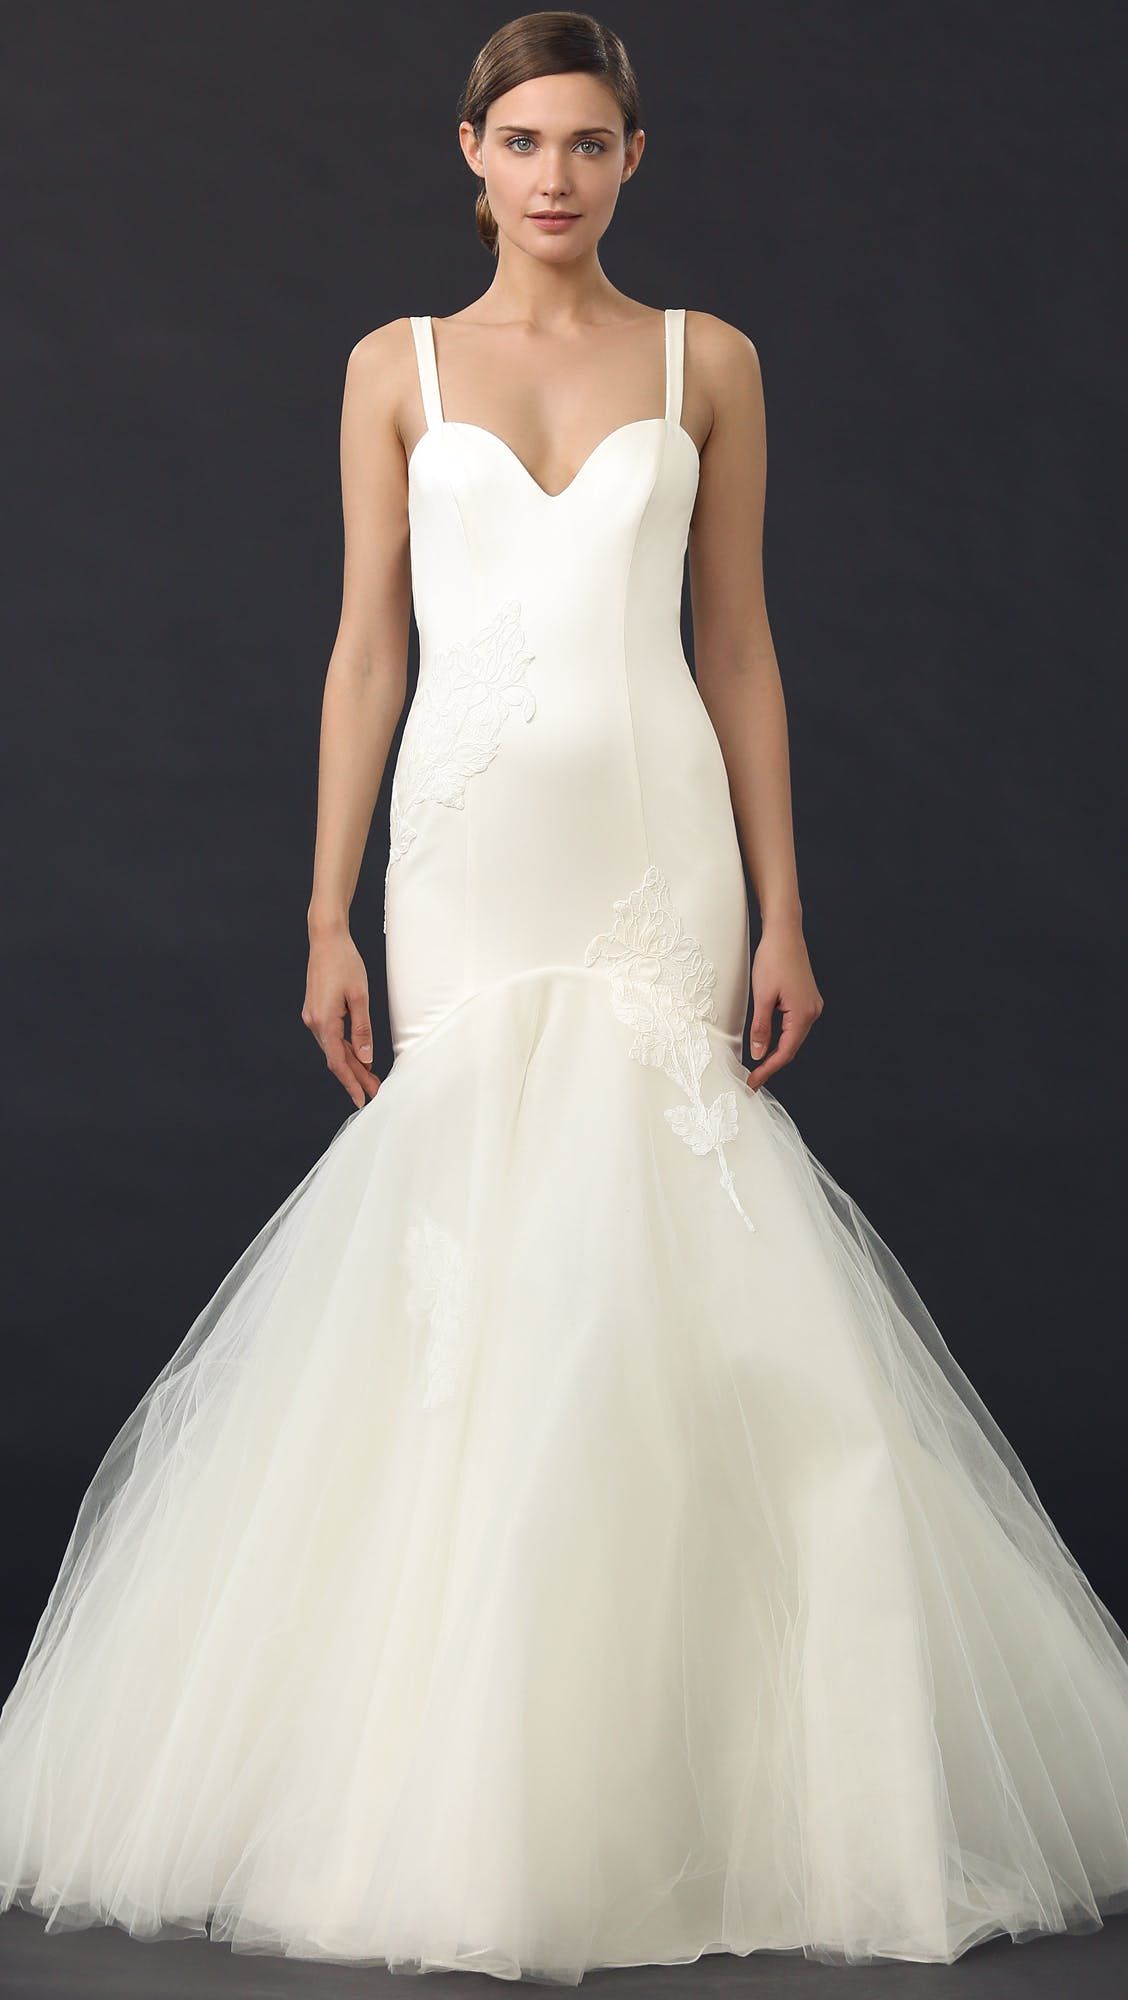 Meghan MarkleApproved Wedding Dresses  Meghan markle Wedding